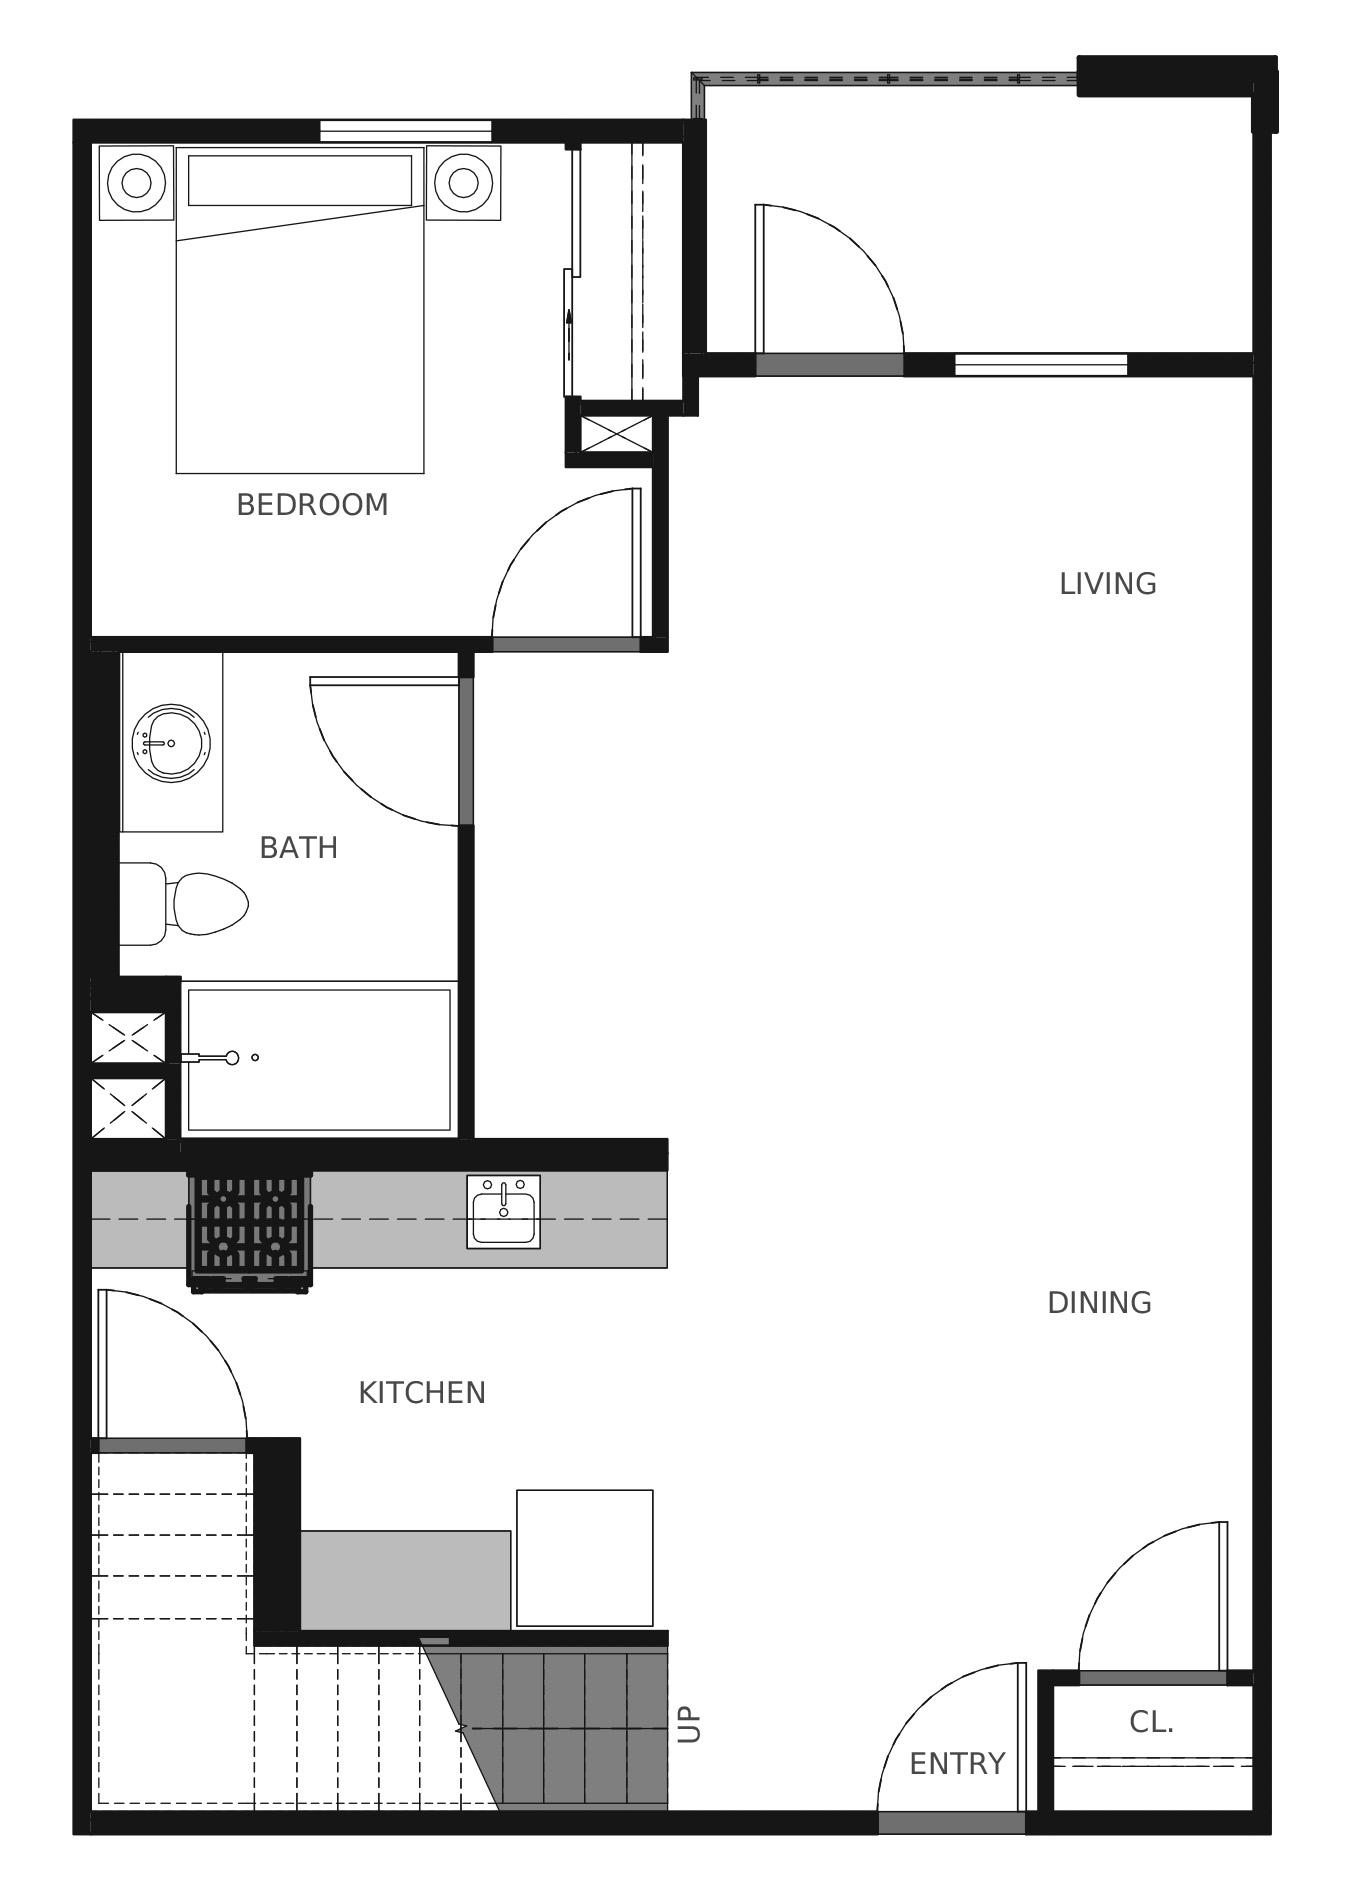 Plan C5 First Floor - 1,444 sq. ft.